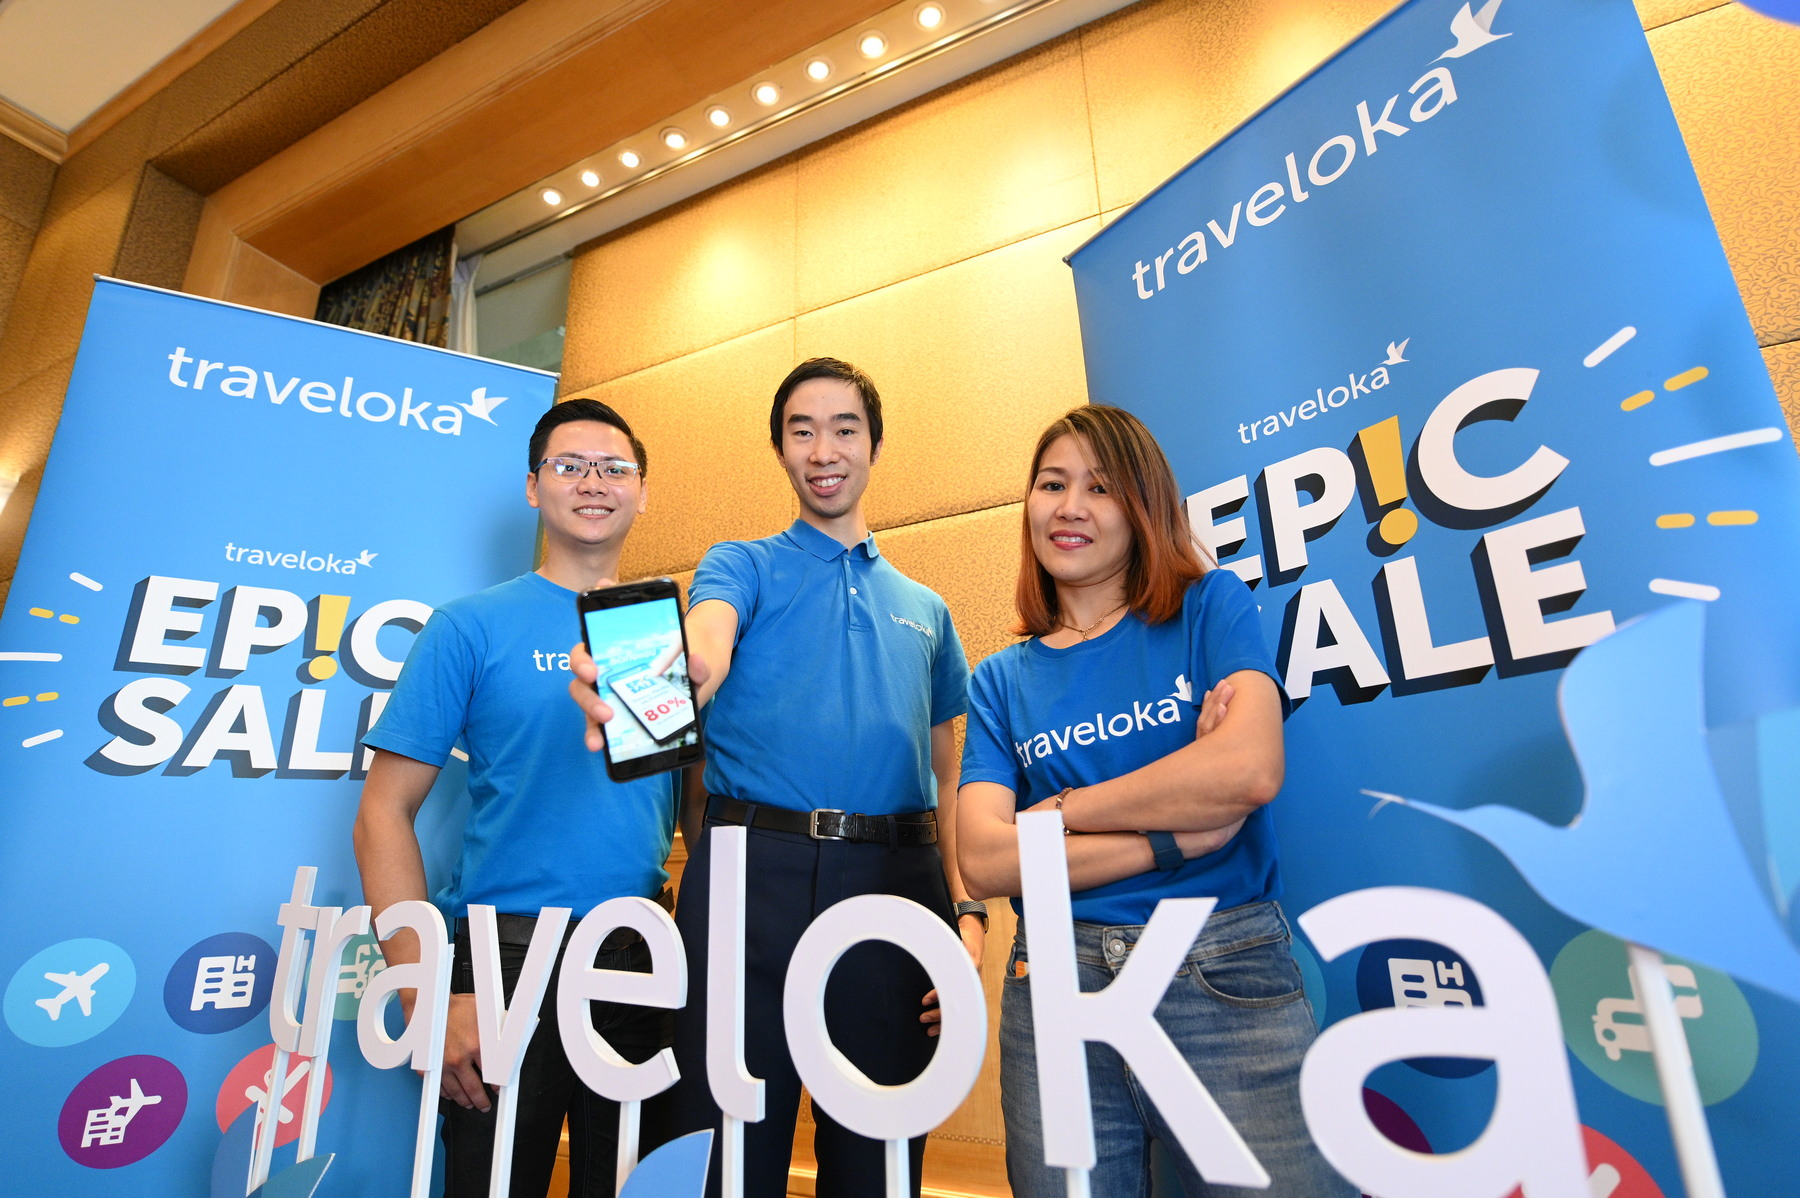 Traveloka_EPIC SALE